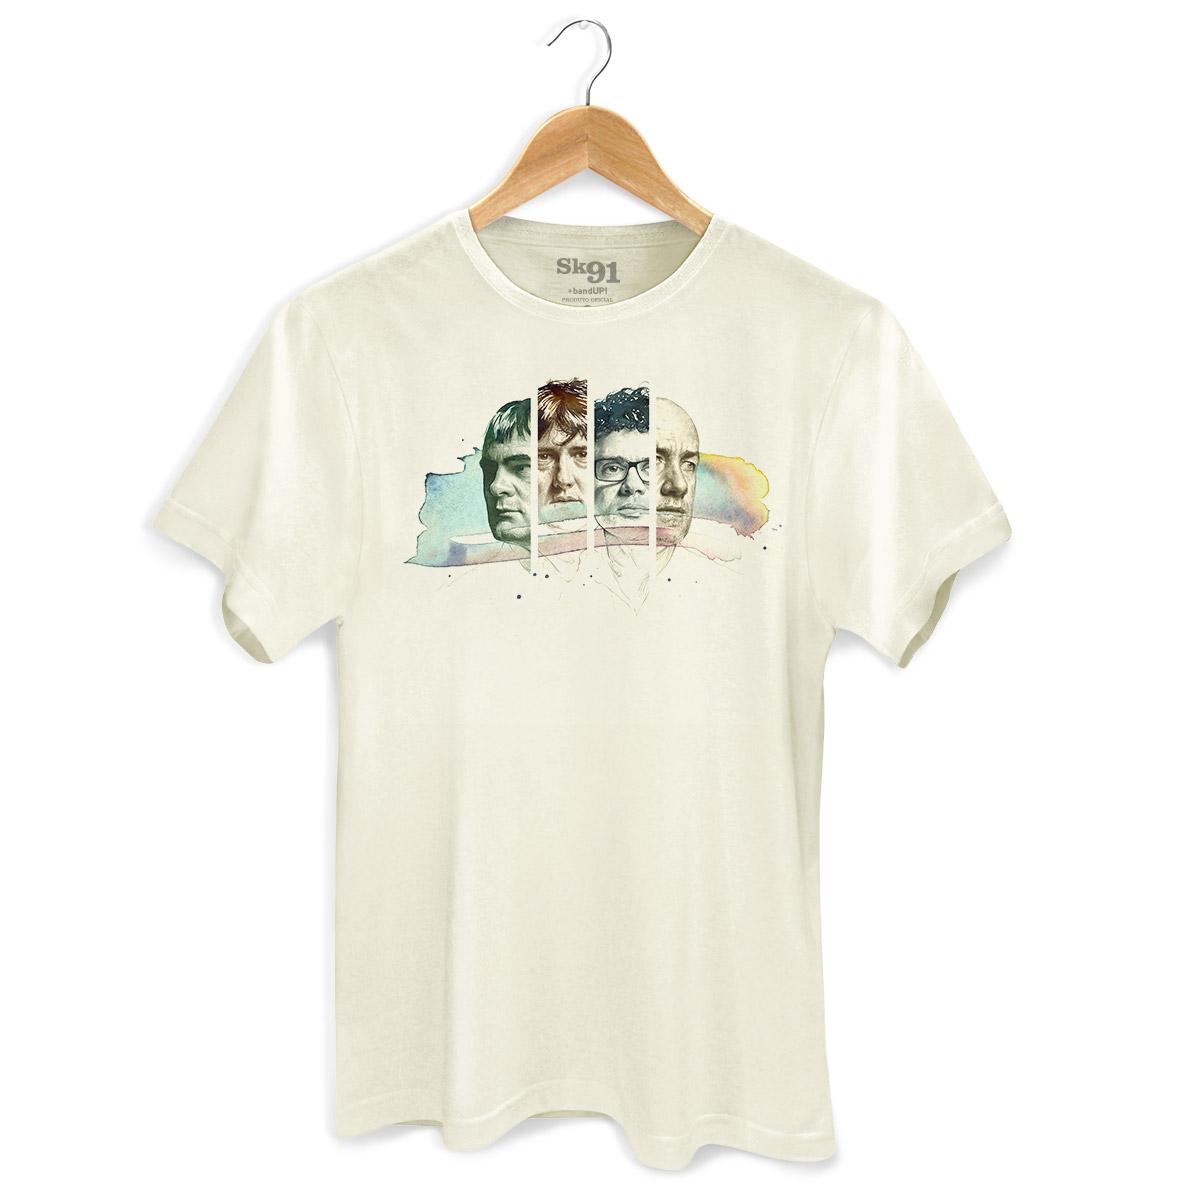 Camiseta Masculina Sk91 Velocia